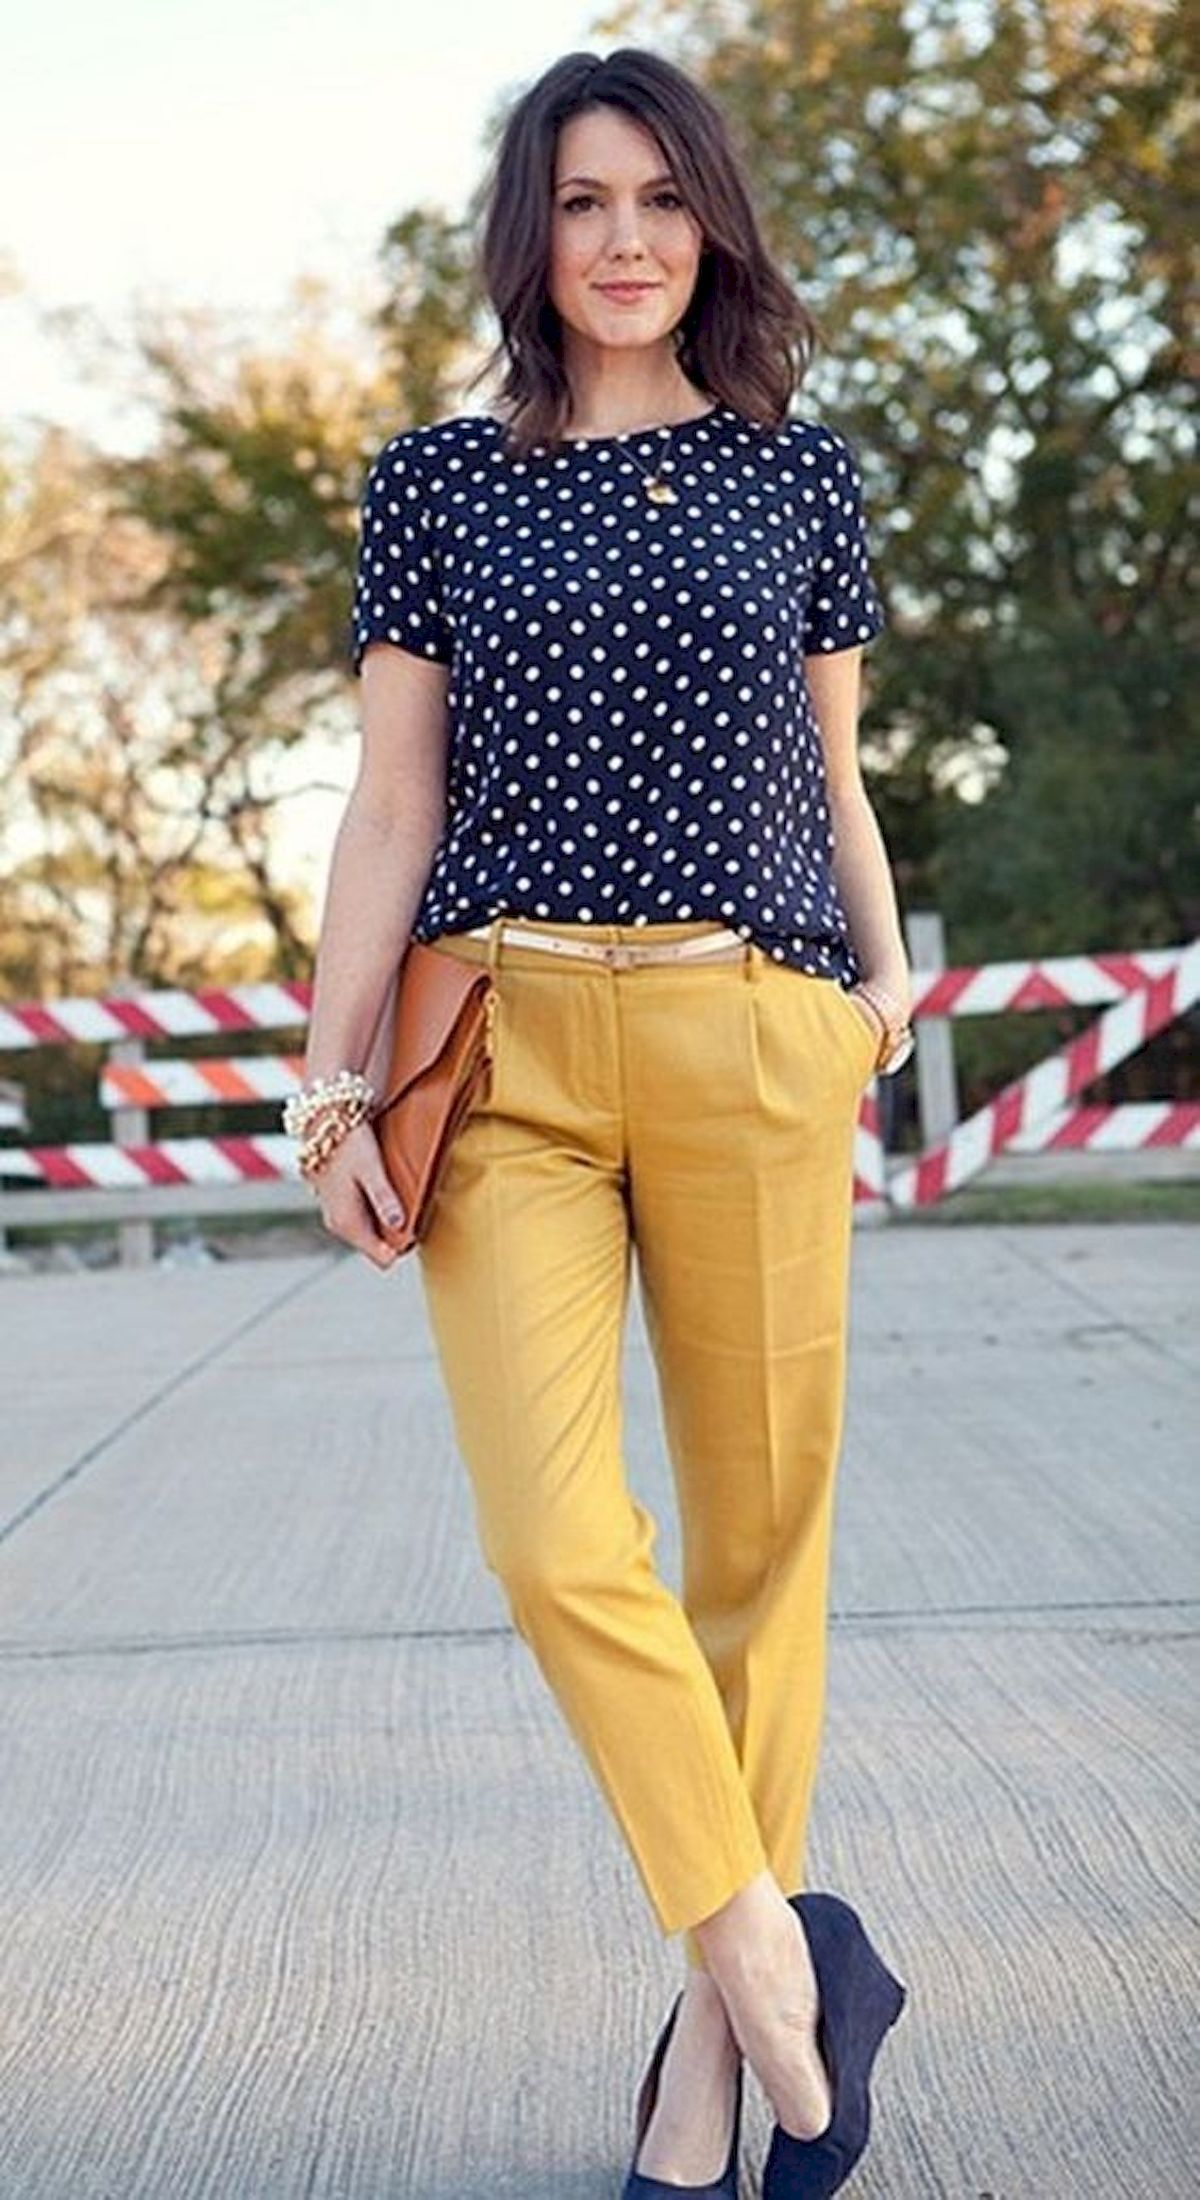 50 Stunning Spring Outfits Work Ideas for Women #businesscasualoutfitsforwomensummer